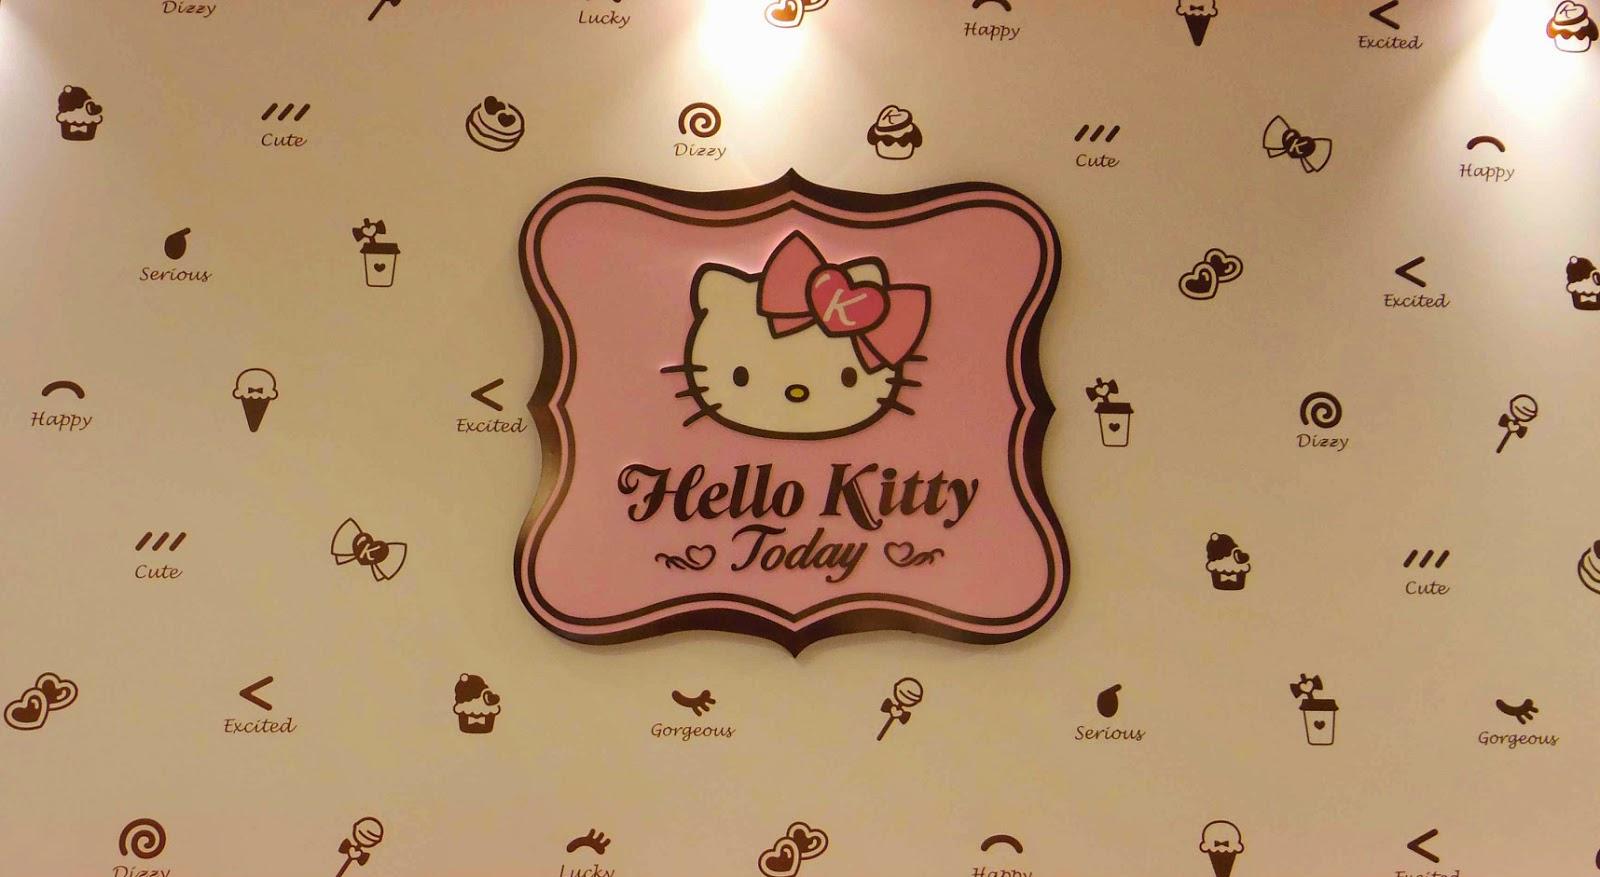 Cute Shanghai Hello Kitty Today Cafe